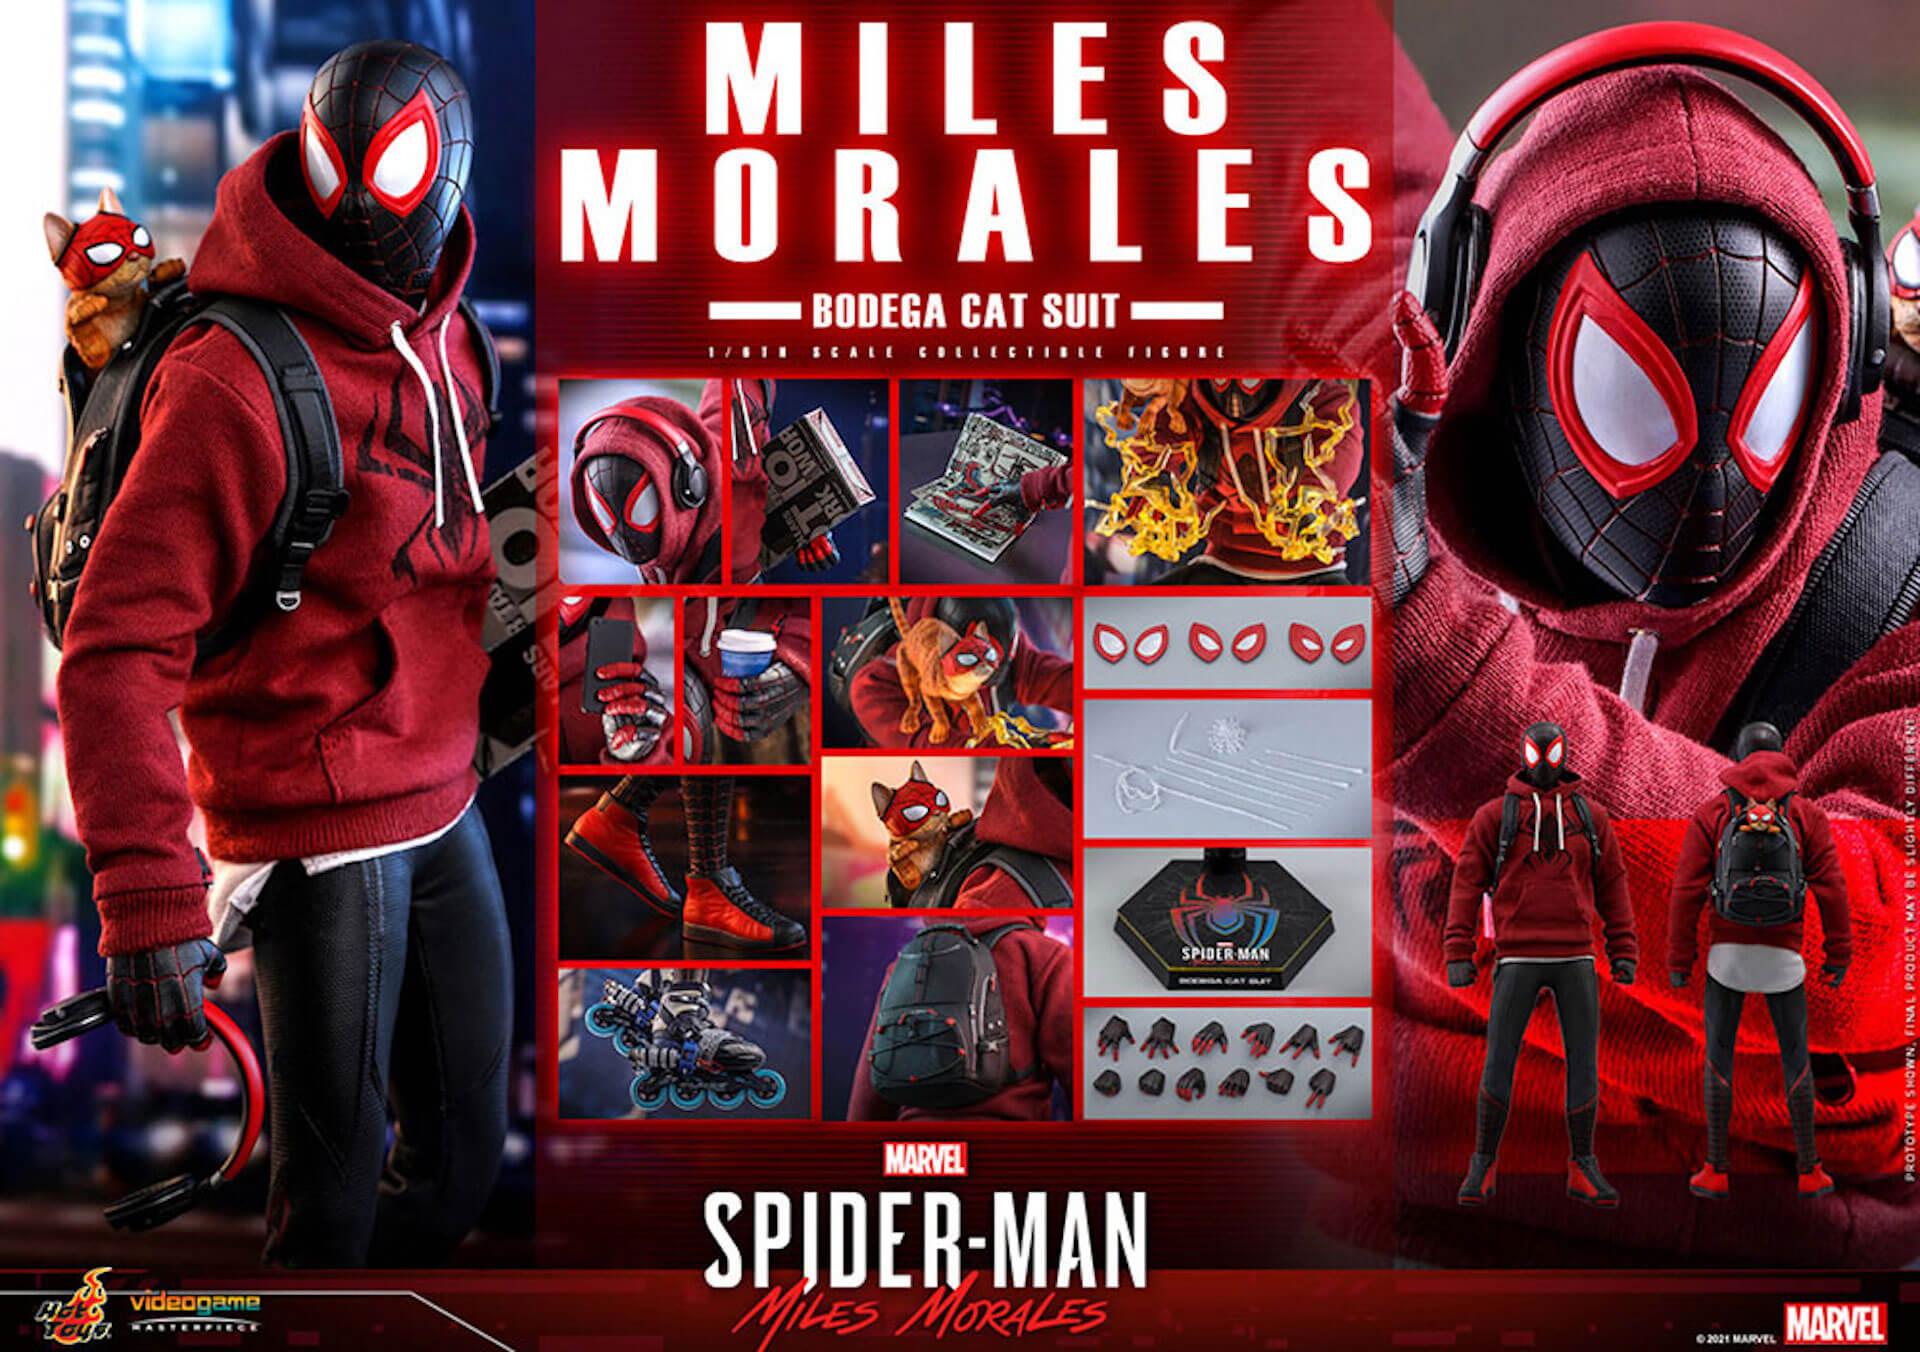 『Marvel's Spider-Man:Miles Morales』のスパイダーマンがホットトイズで超精巧なフィギュアになって登場! art210601_spiderman_hottoys_1